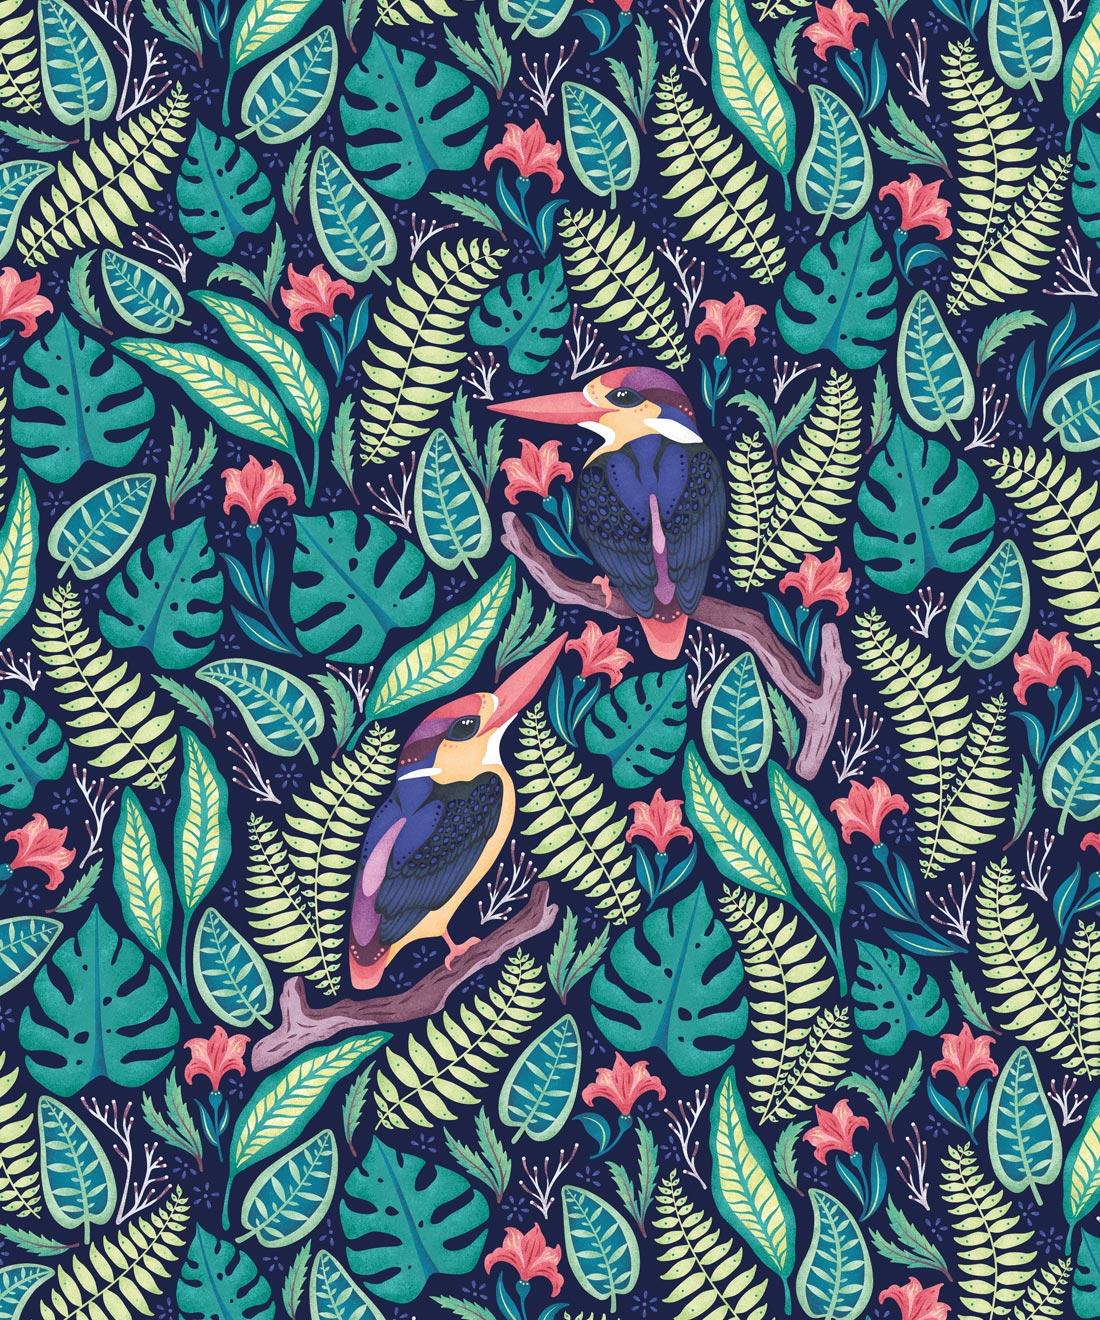 Exotic Kingfishers Wallpaper